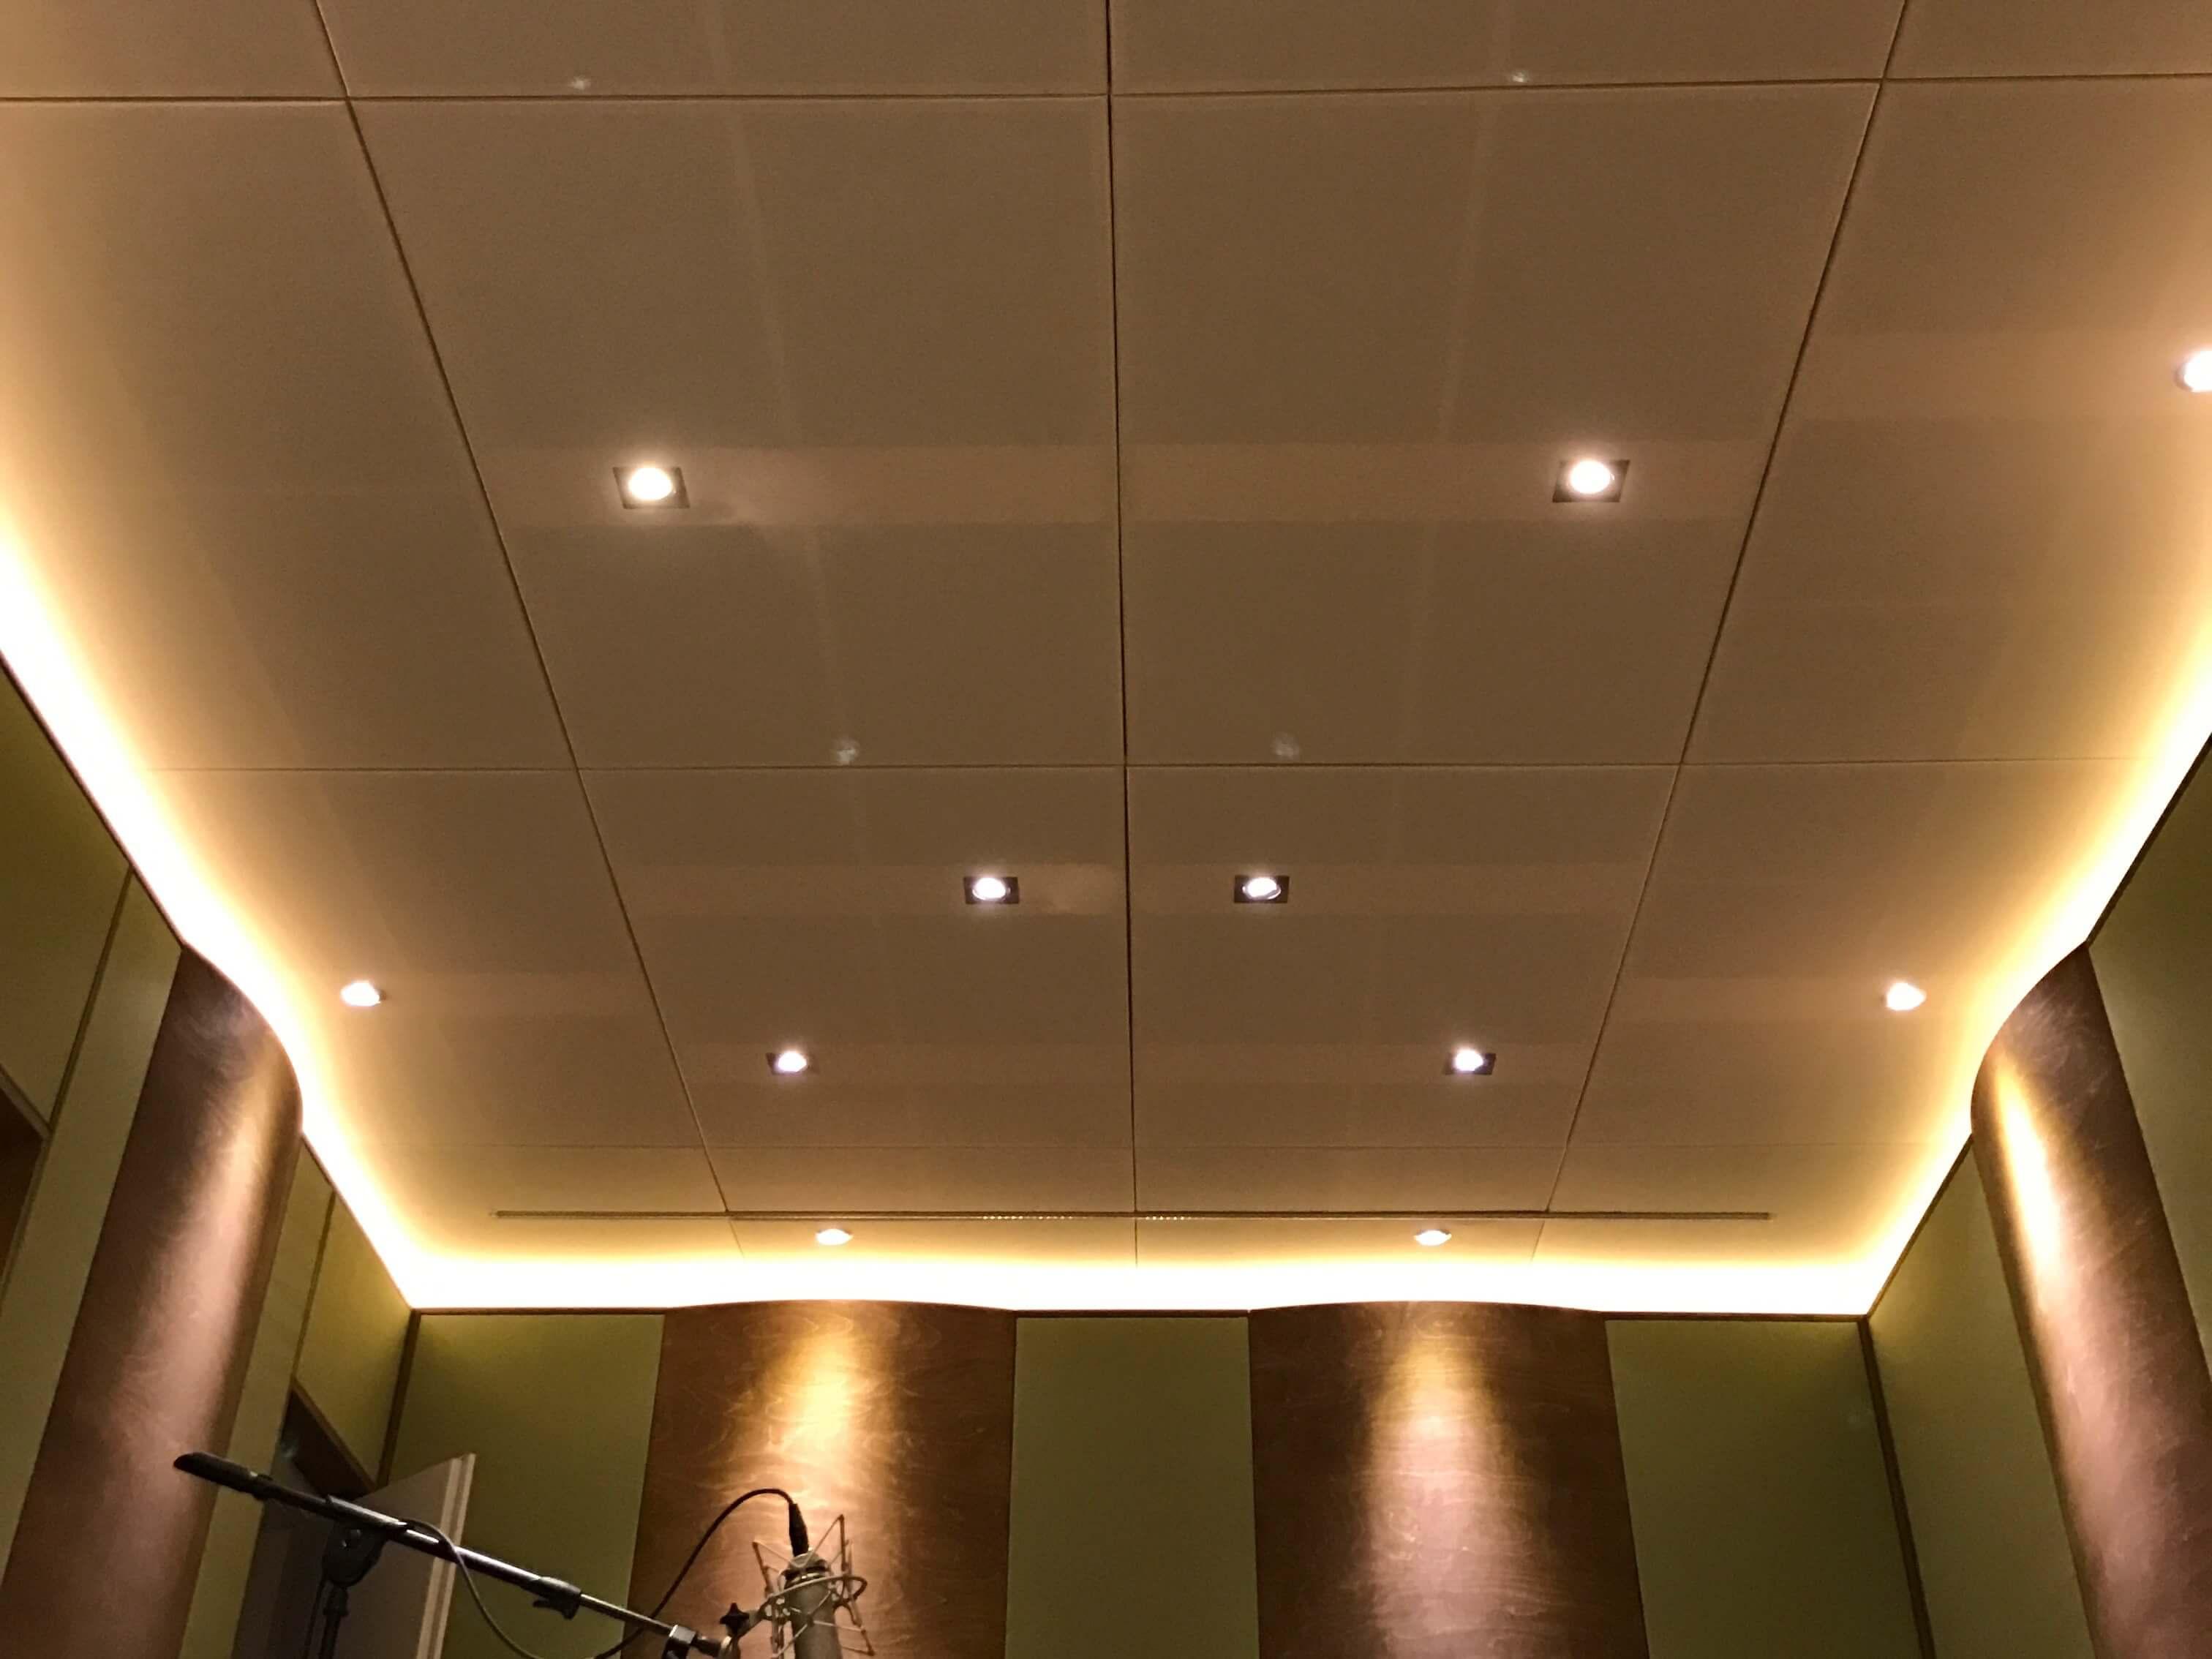 Das größte Kapital eines Tonstudios – Technik wechselt, Akustik bleibt